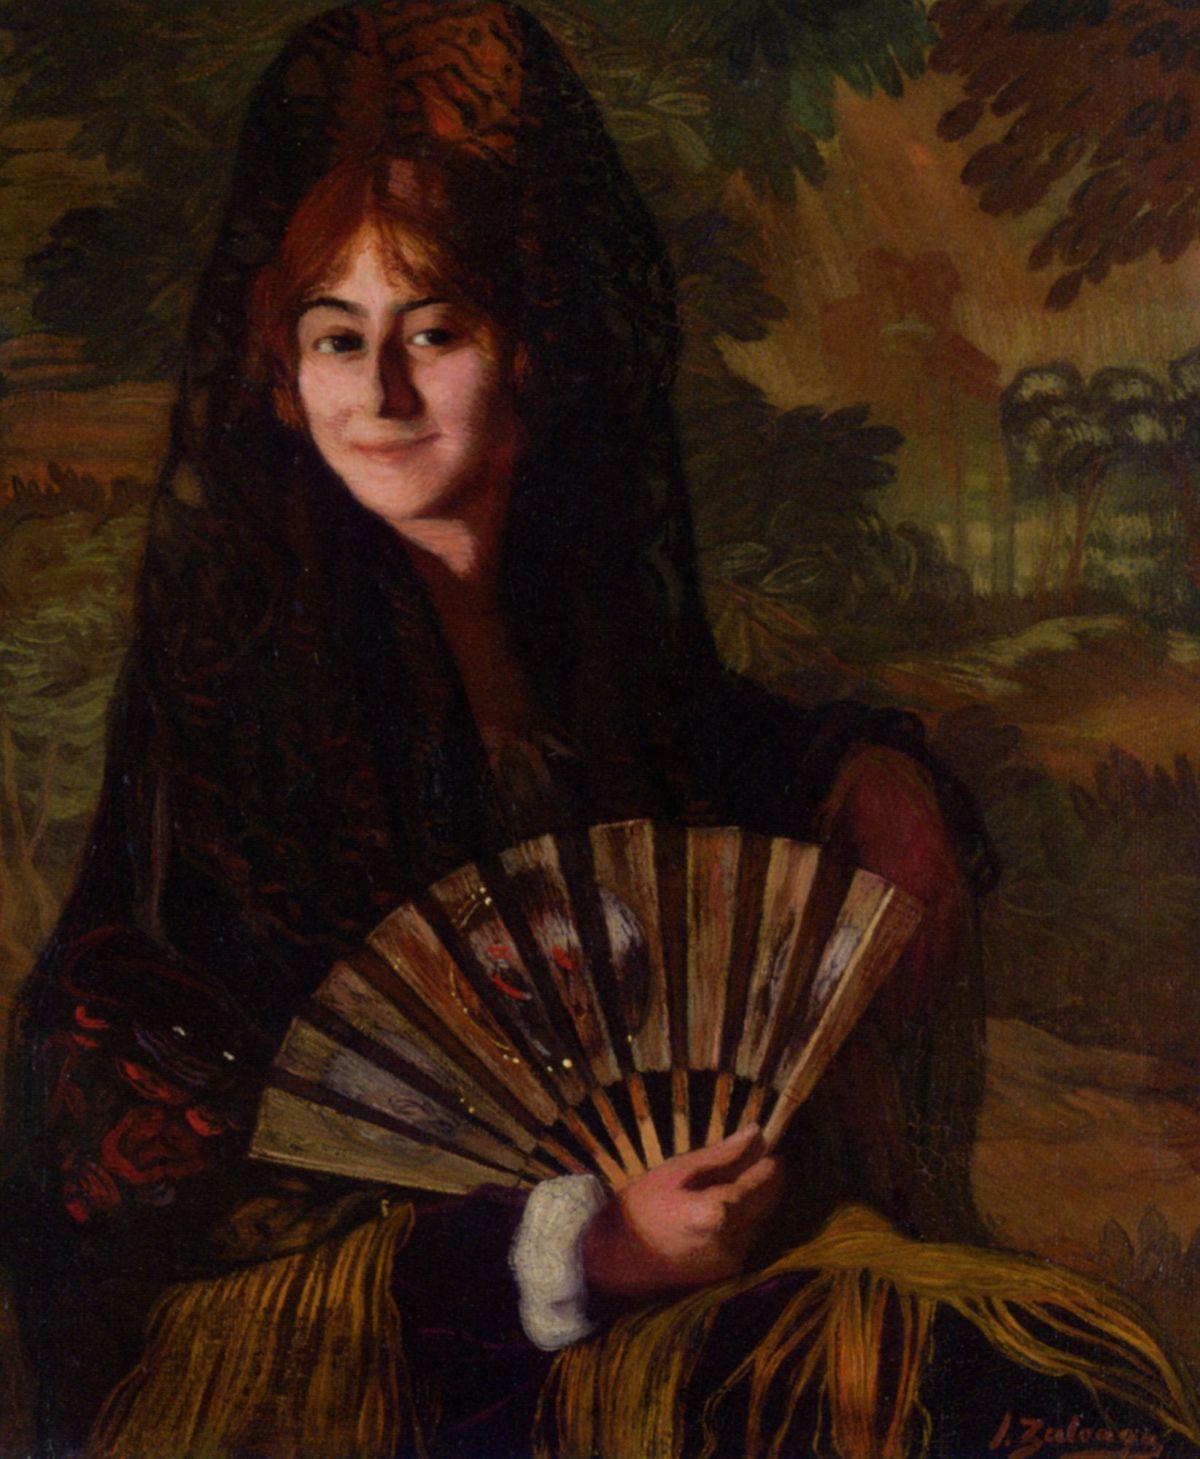 Dama con abanico by Ignacio Zuloaga y Zabaleta